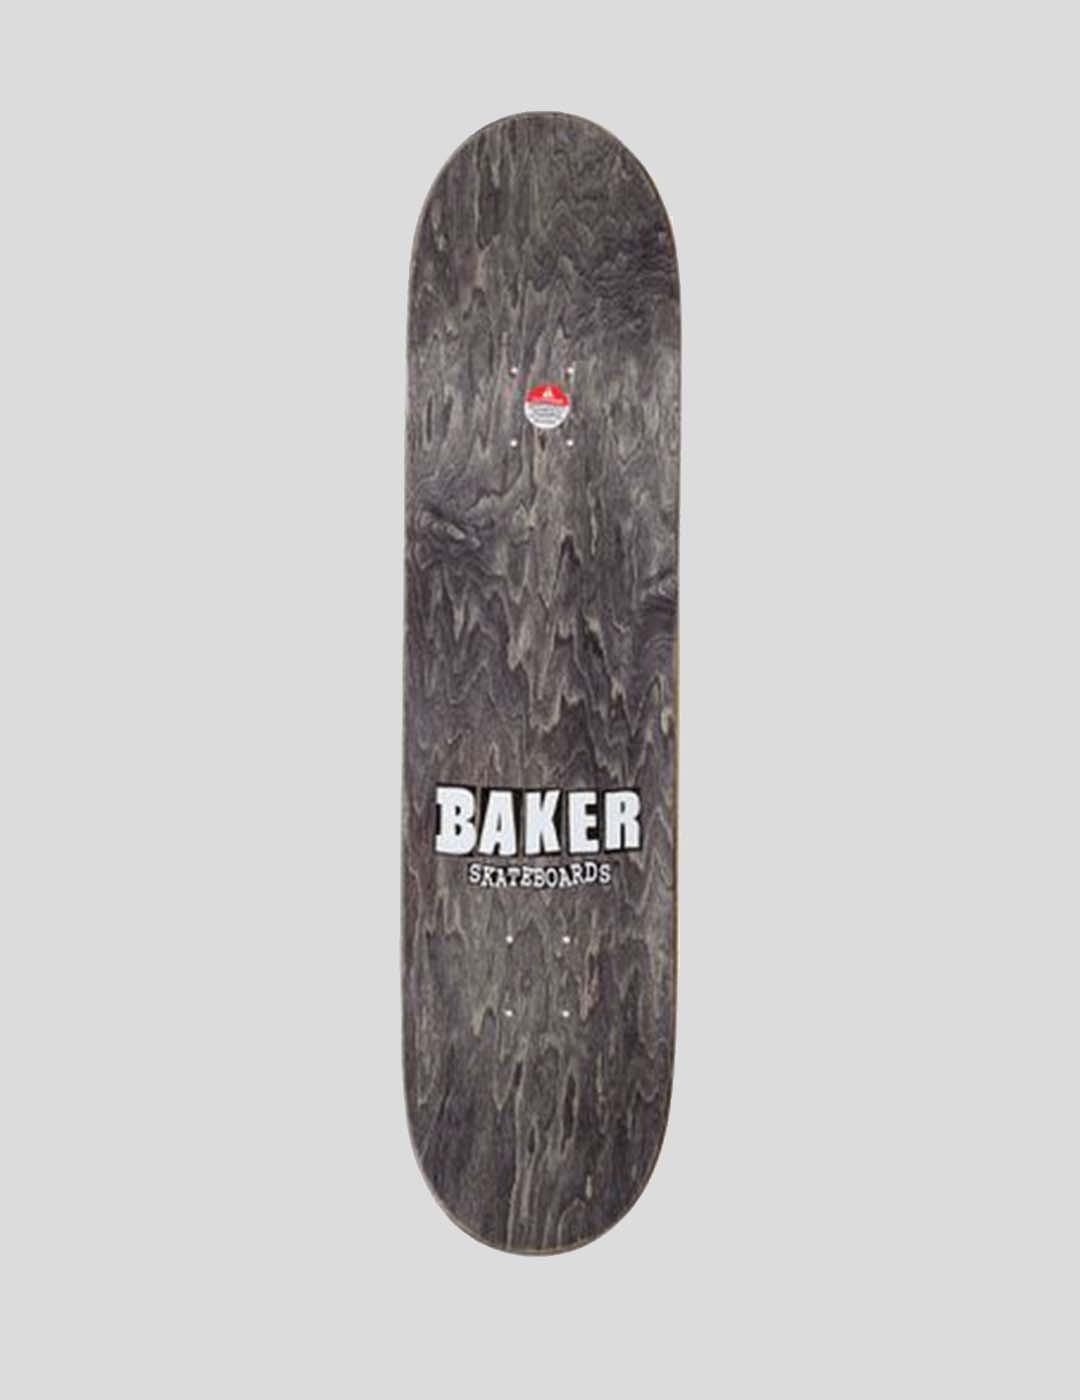 "TABLA BAKER REYNOLDS ABQ 8.125"" DECK"